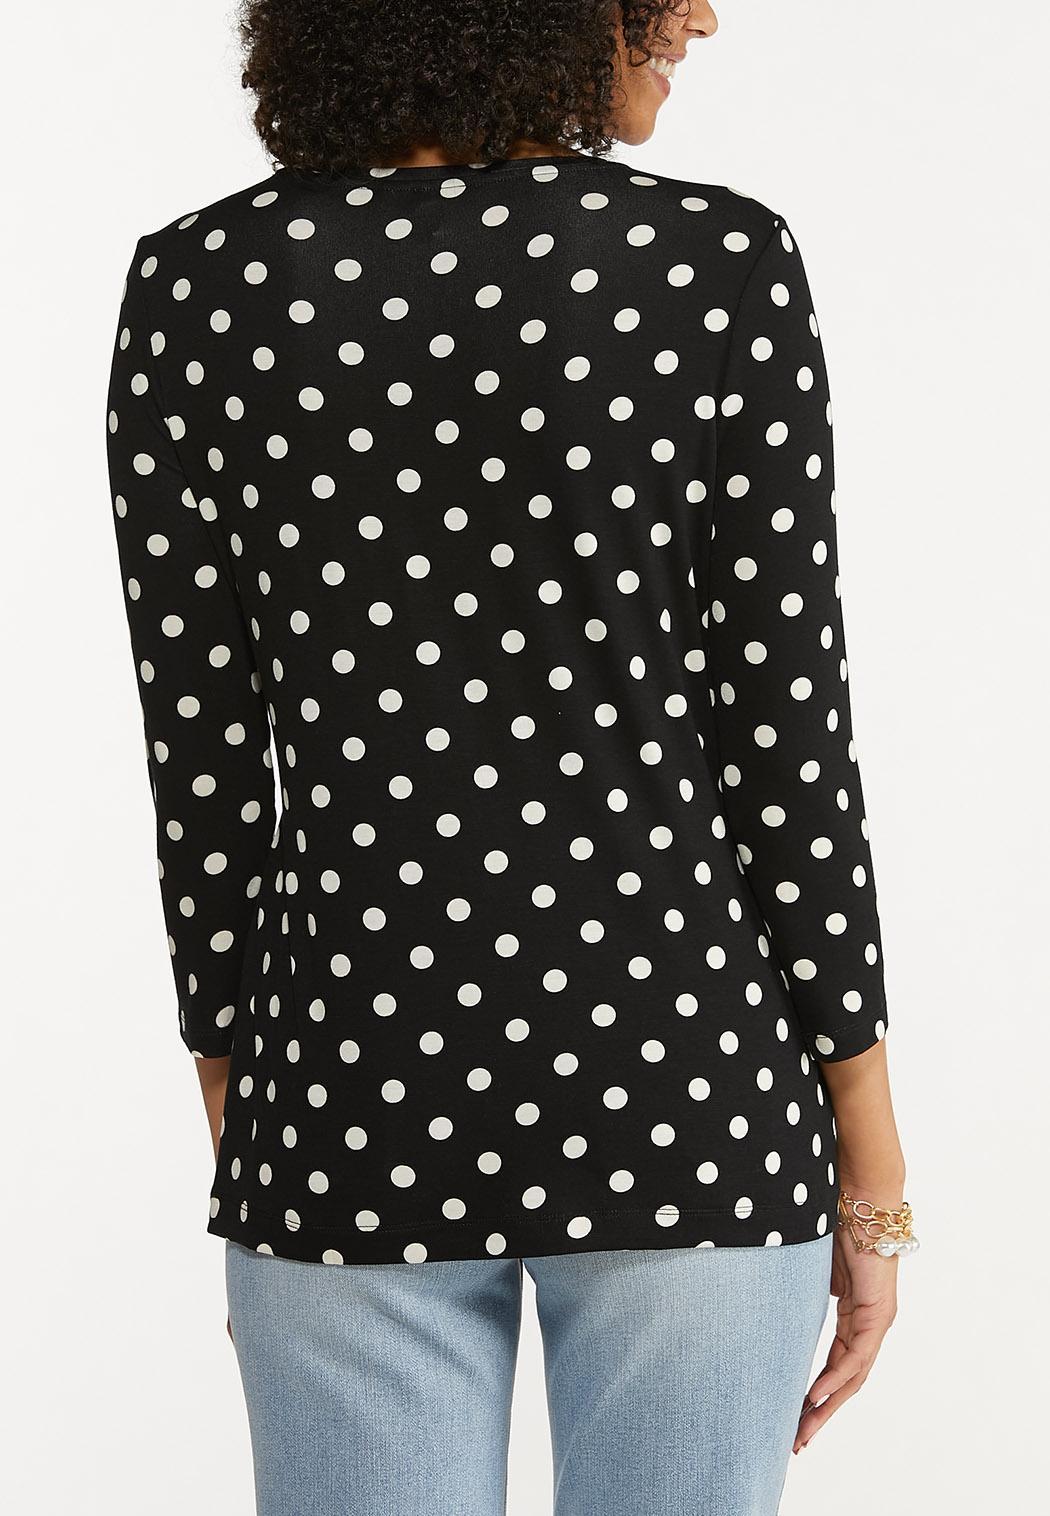 Plus Size Contrast Polka Dot Top (Item #44690853)